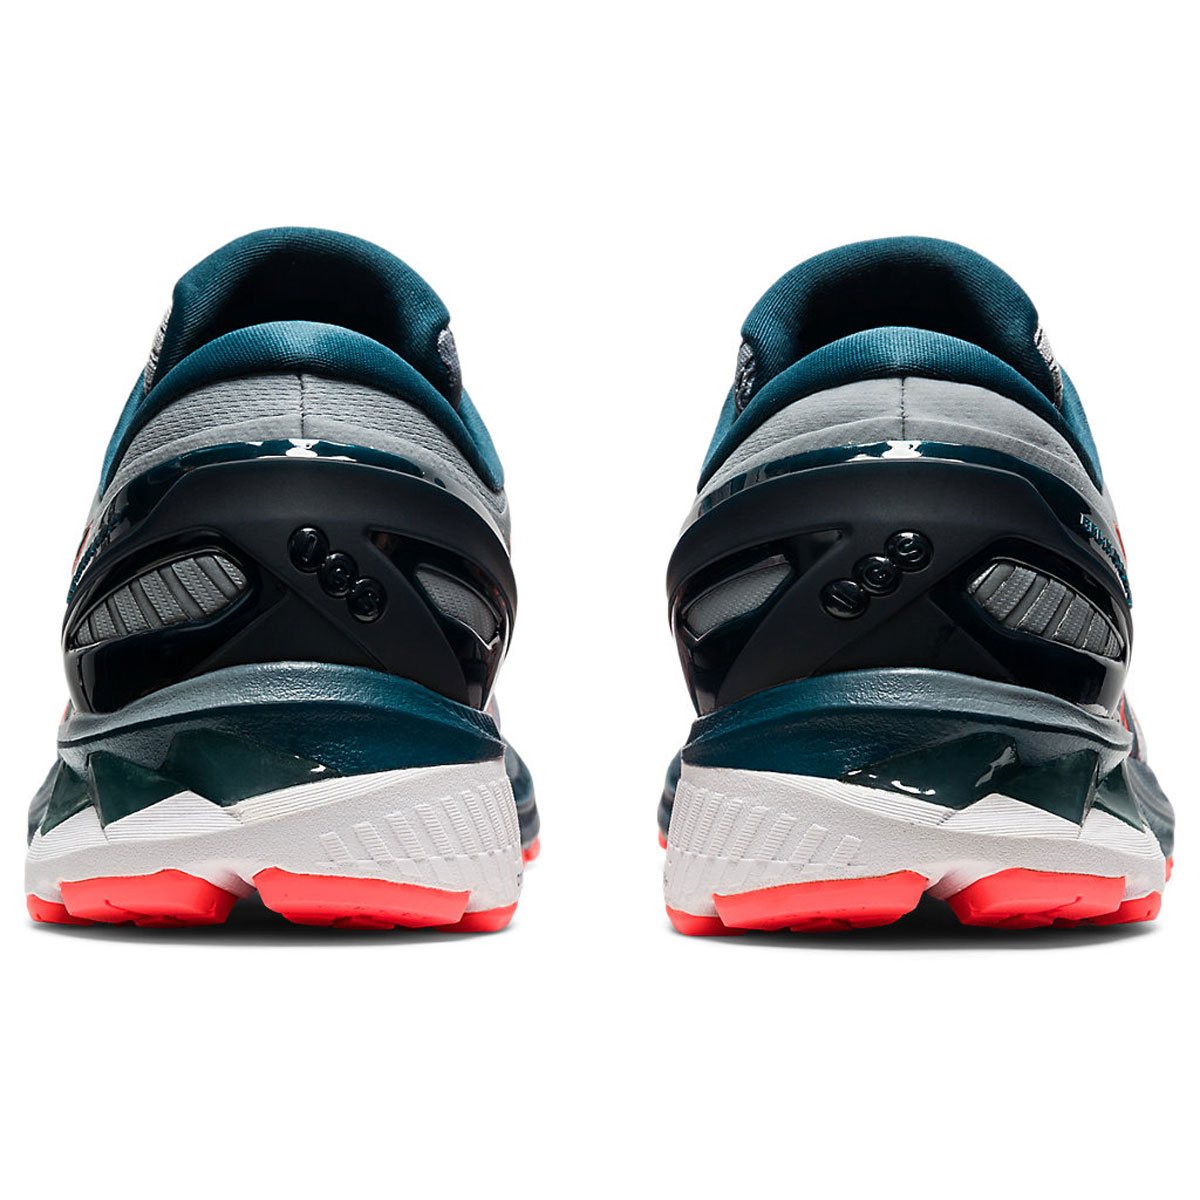 Men's Asics GEL-Kayano 27 Running Shoe - Color: Sheet Rock/Magn (Regular Width) - Size: 6, Sheet Rock/Magnetic Blue, large, image 5